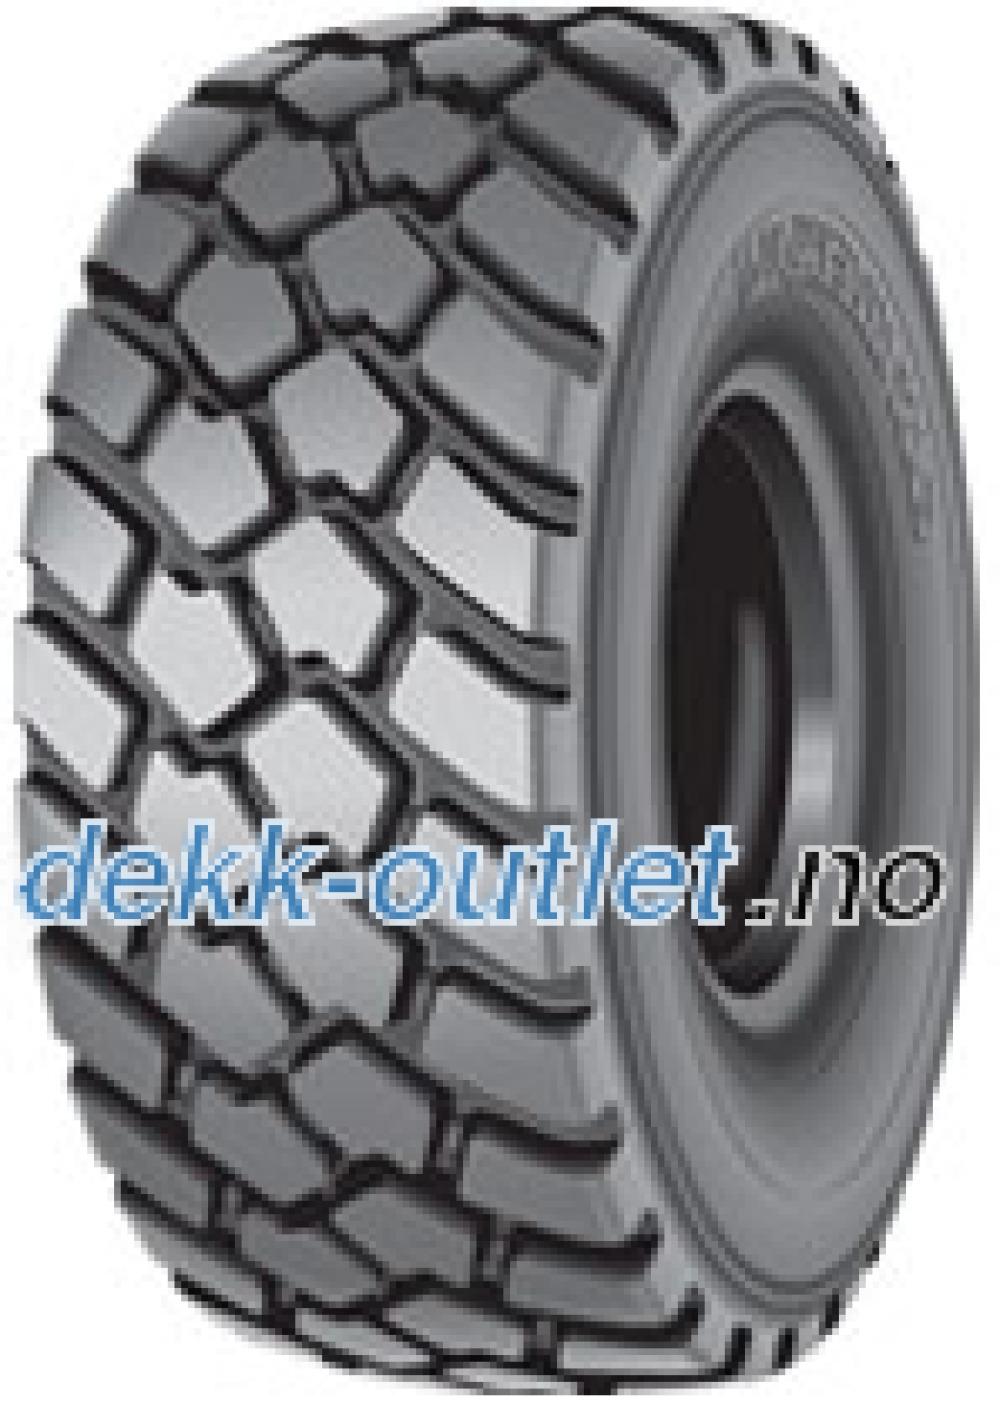 Michelin XLD L3 ( 650/65 R25 TL dobbel merking 23.5R25 , Tragfähigkeit * )